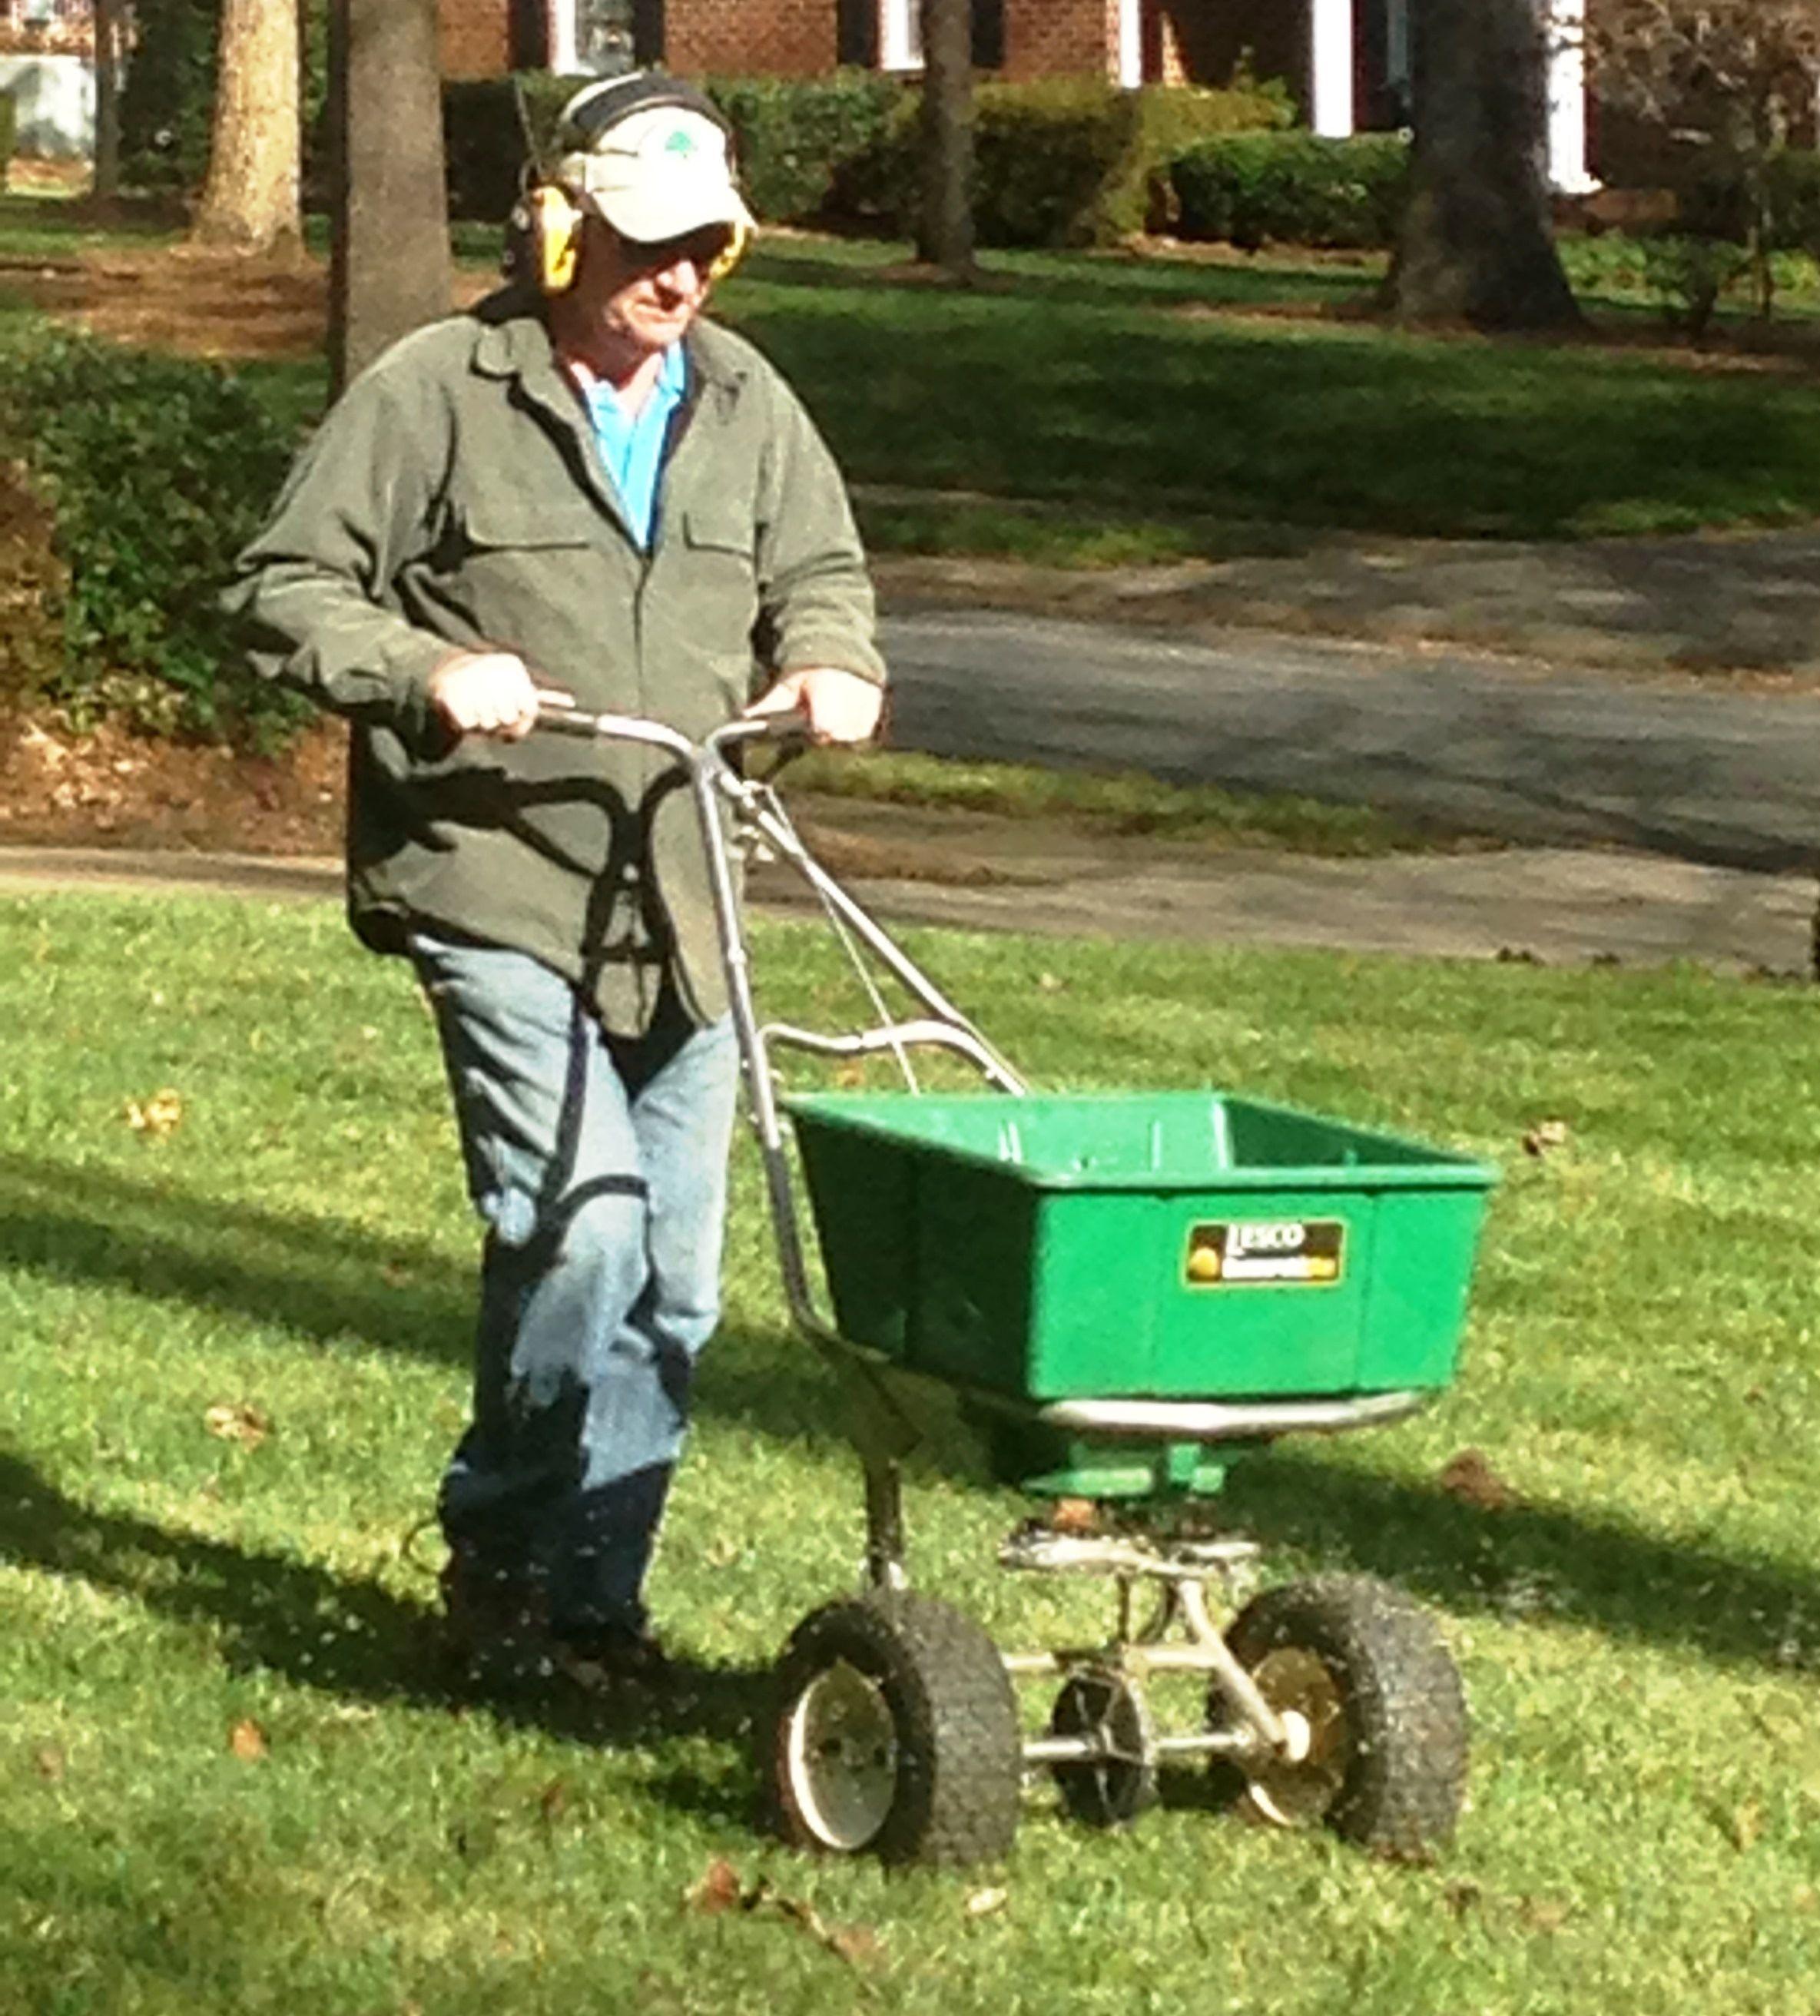 Joe Morrison, Owner and Operator of Morrison Lawn & Landscape, is applying a granular winter fertilizer on his customer lawns during December.